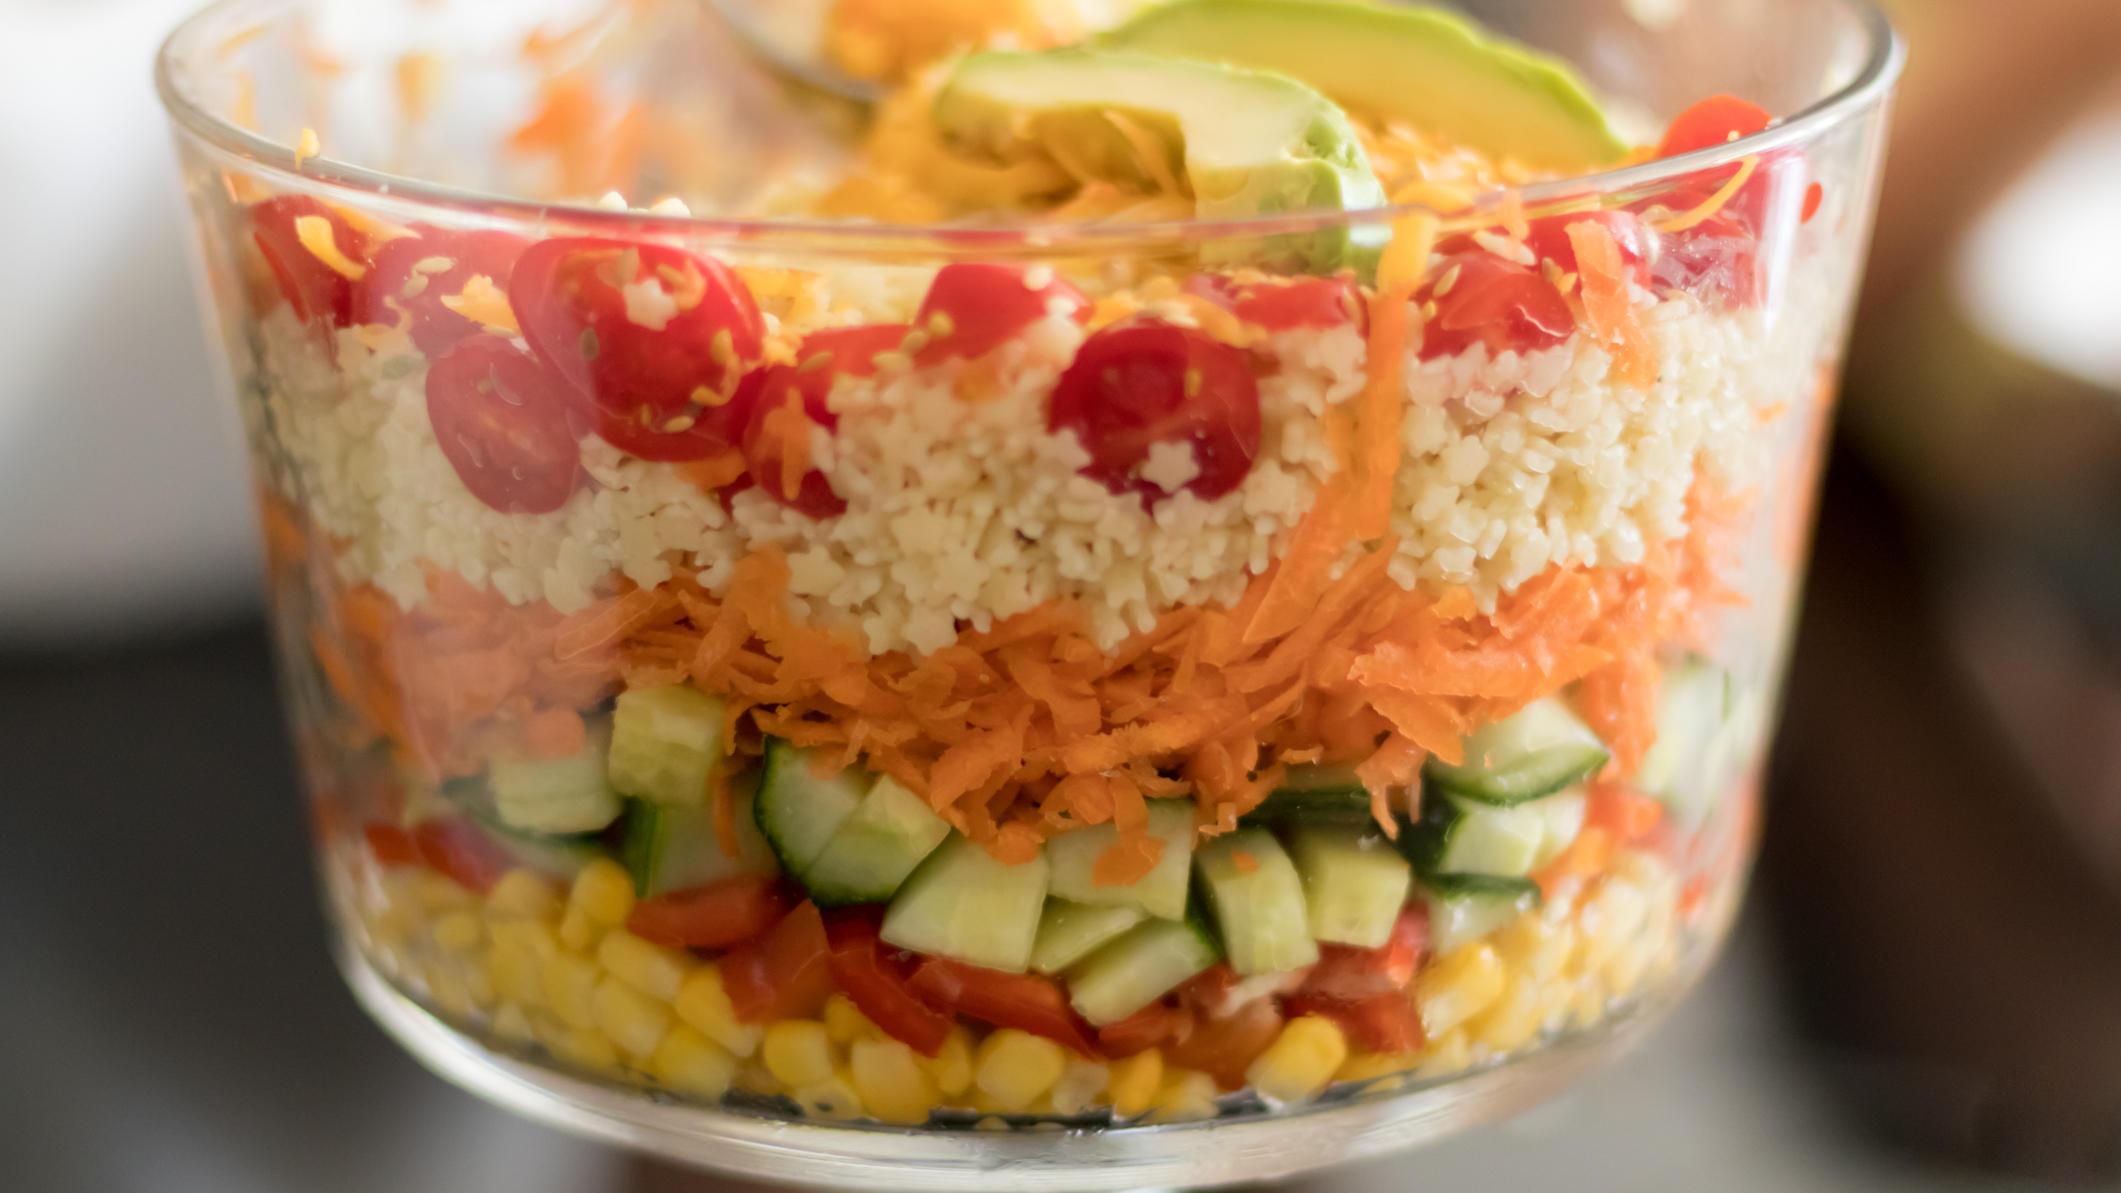 Beherrscht noch immer die Partybuffets: Der Schichtsalat.